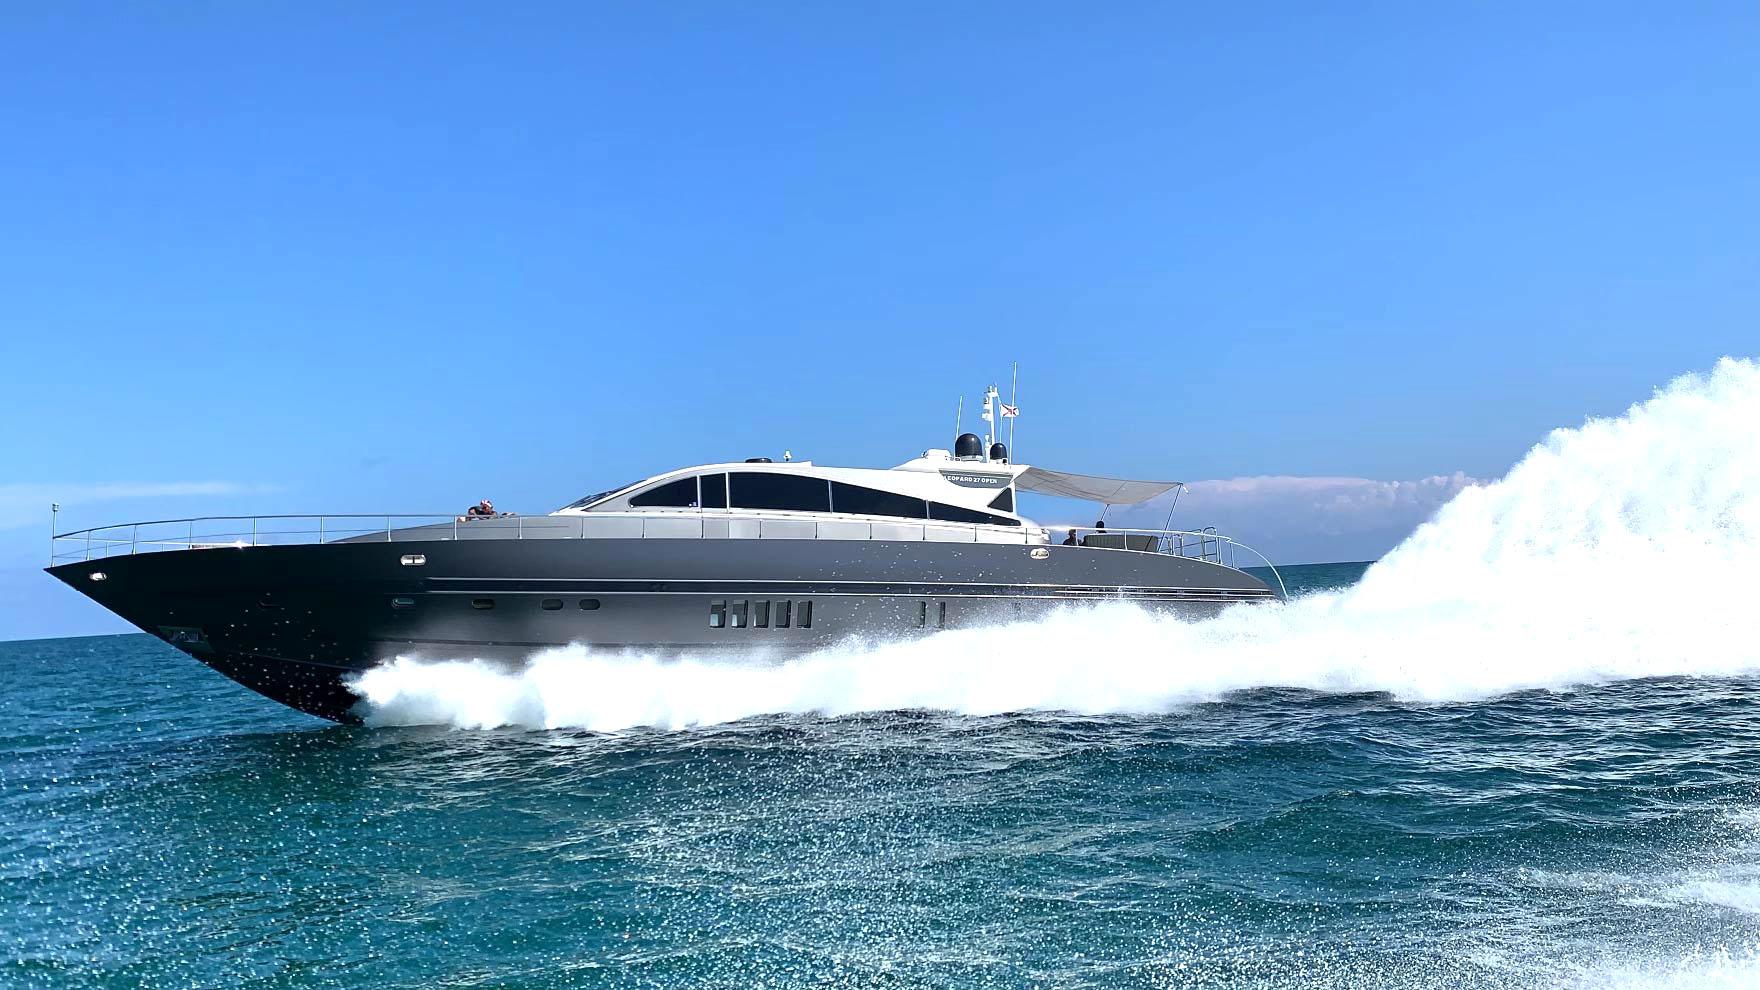 90-leopard-yacht-charter-miami-beach-bahamas-cover-zen